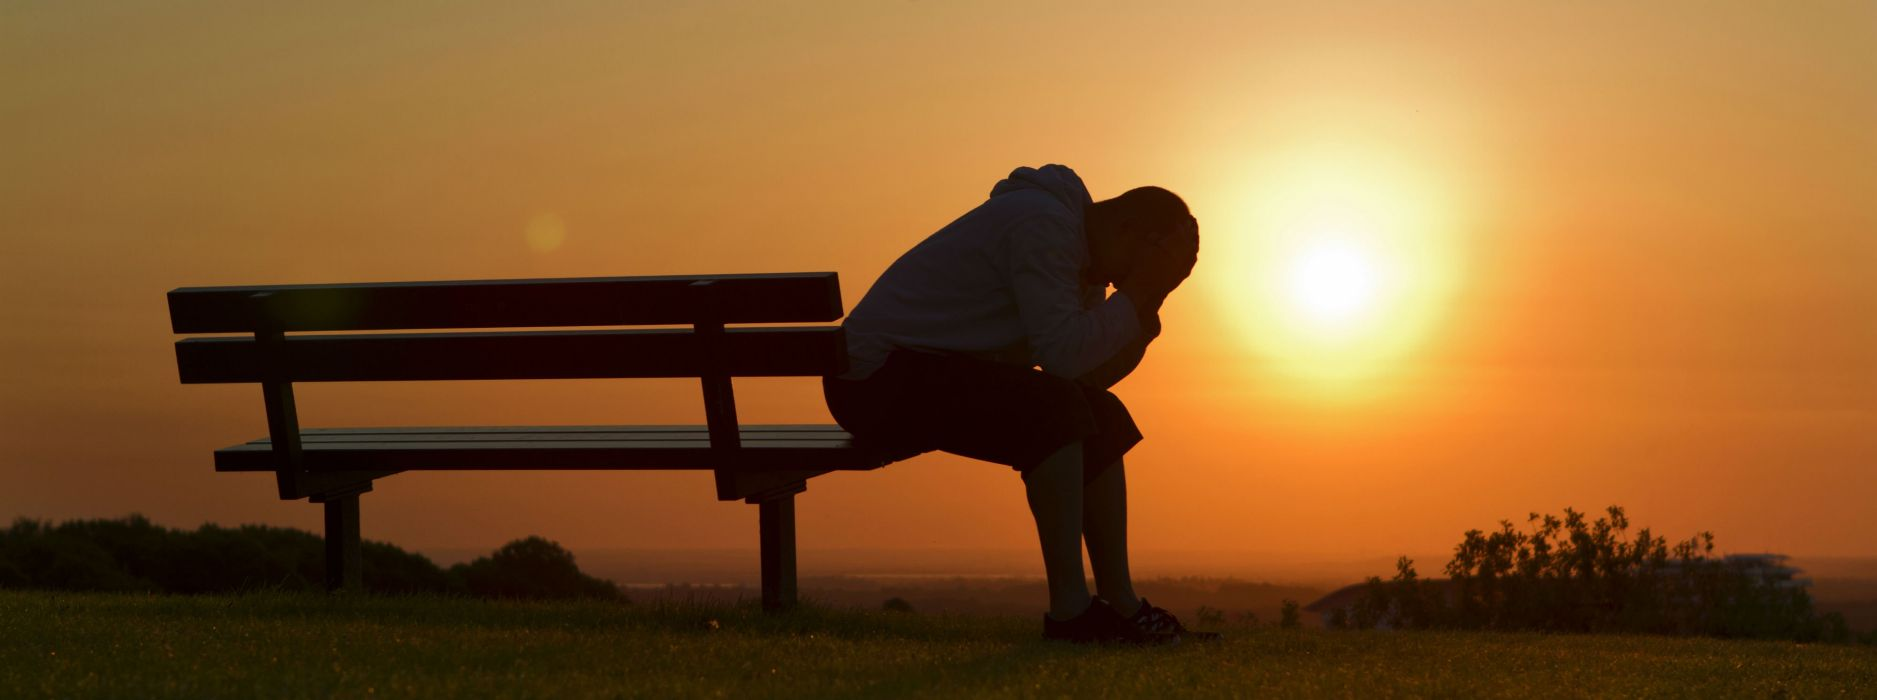 Beautiful Sad Alone Girl Wallpaper Sad Mood Sorrow Dark People Love Sunset Wallpaper